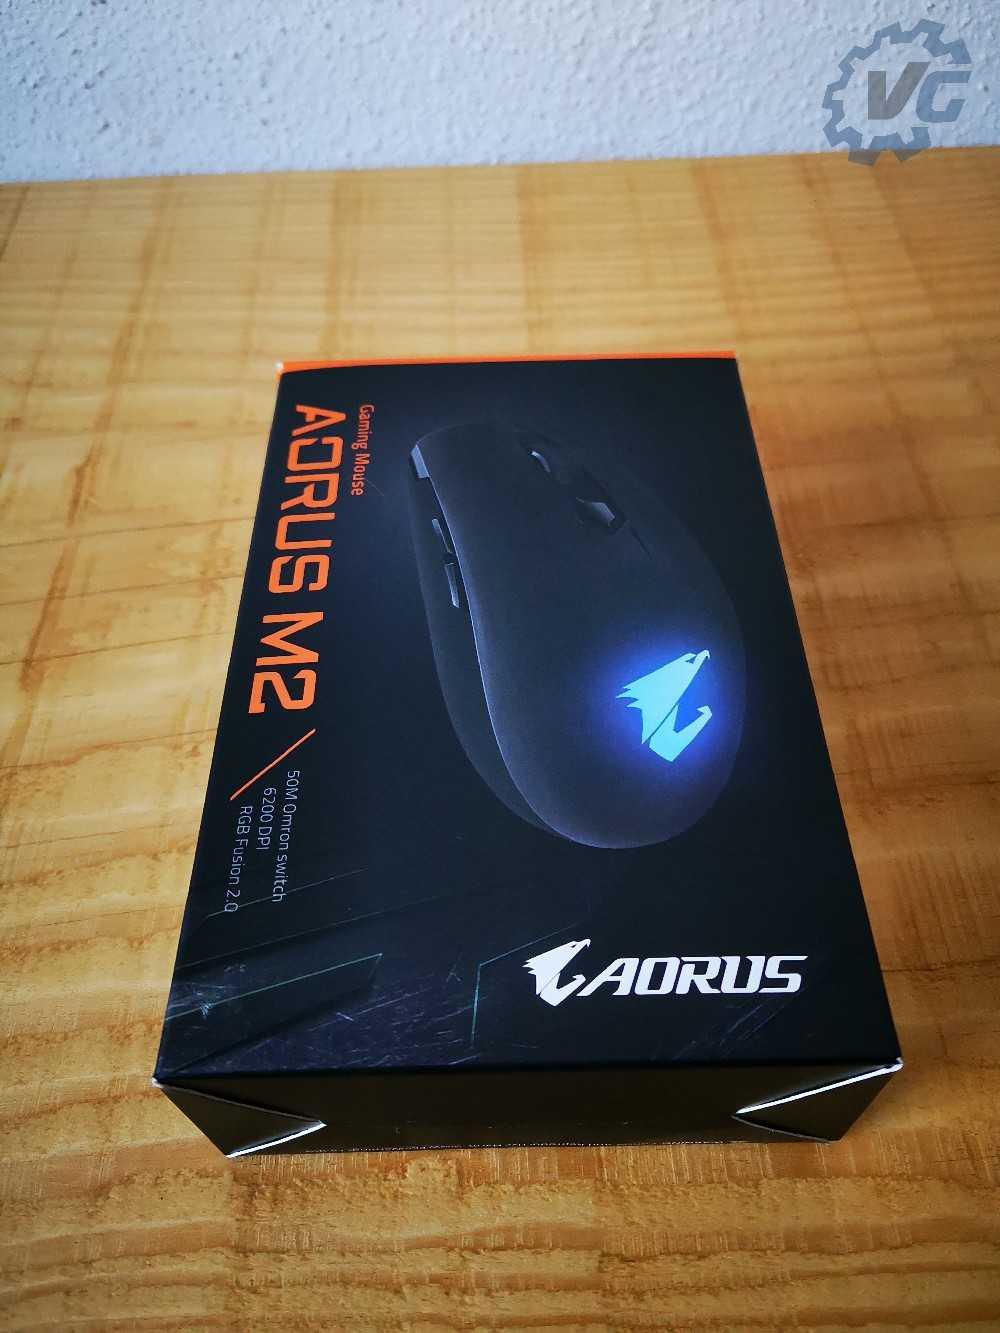 Carton de la souris Aorus M2 face avant